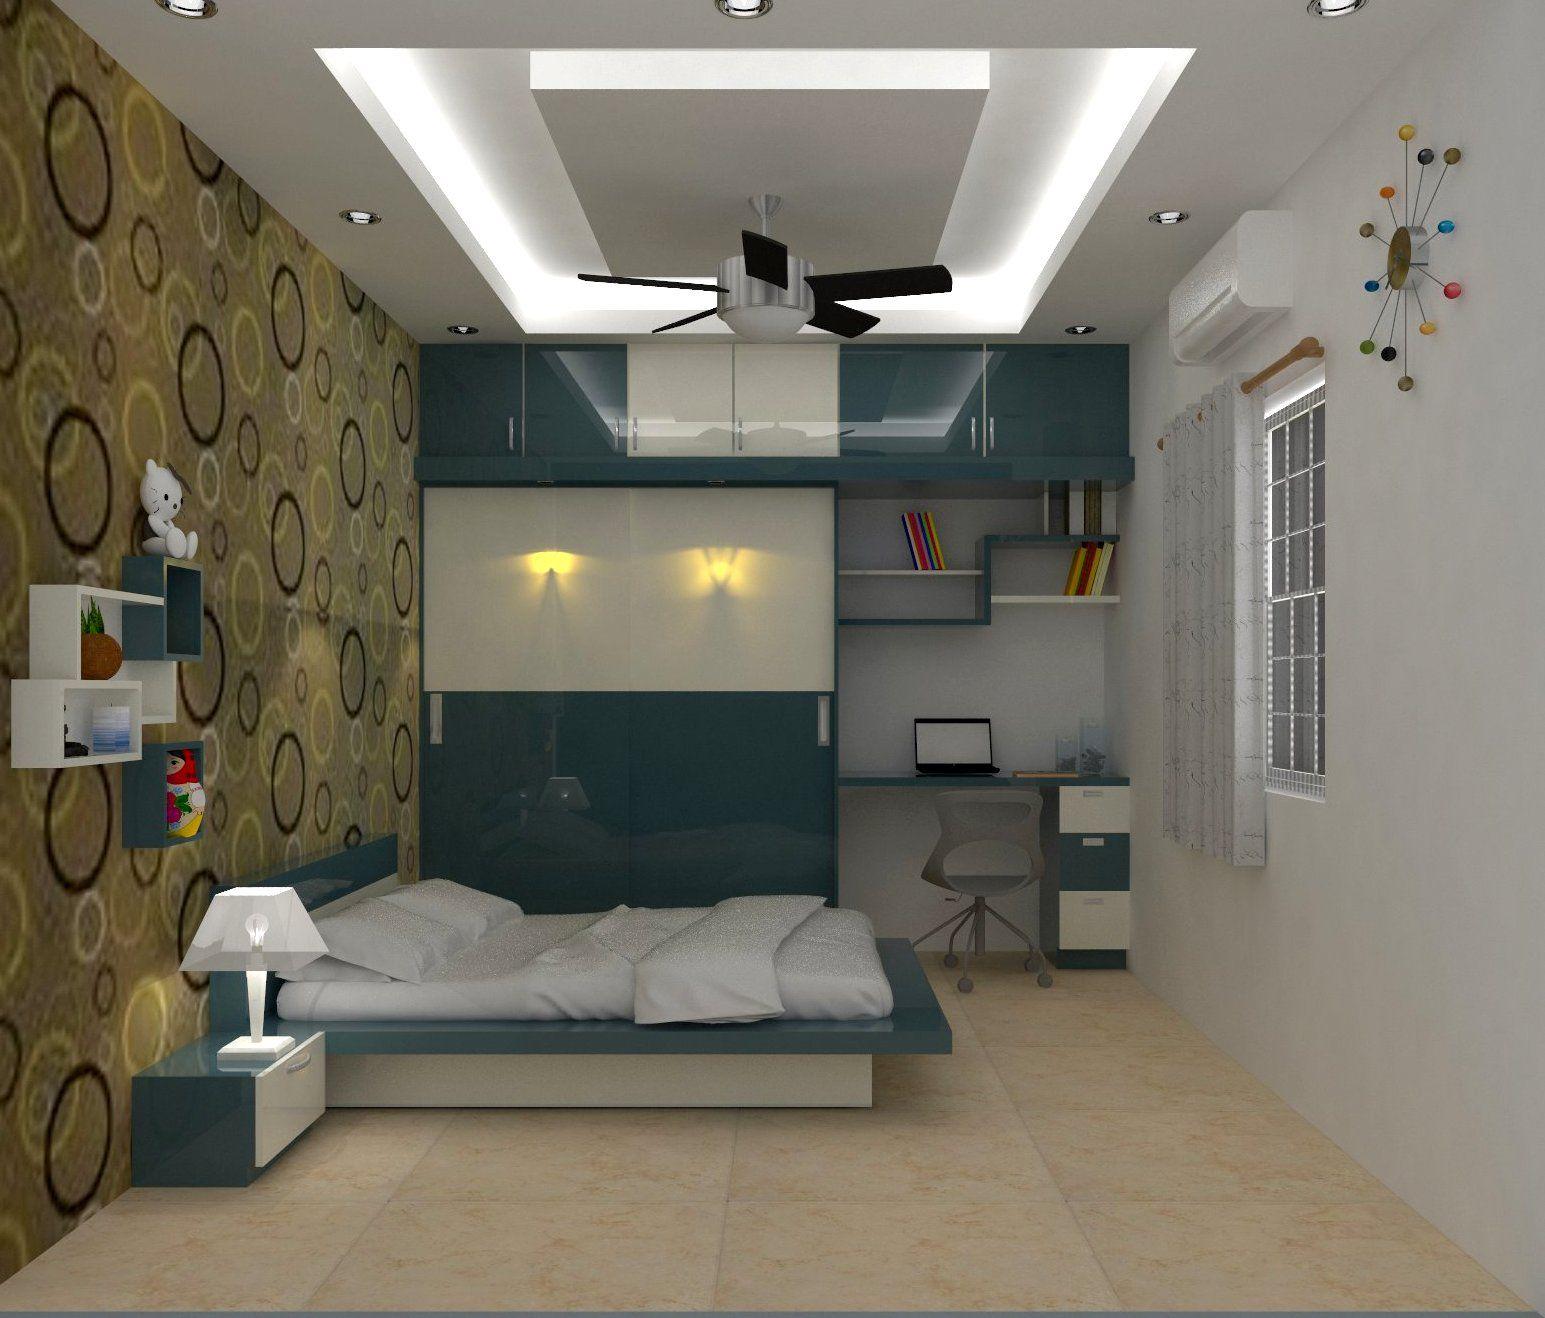 Pin By Seema Mishra On Bedroom False Ceiling Design Bedroom